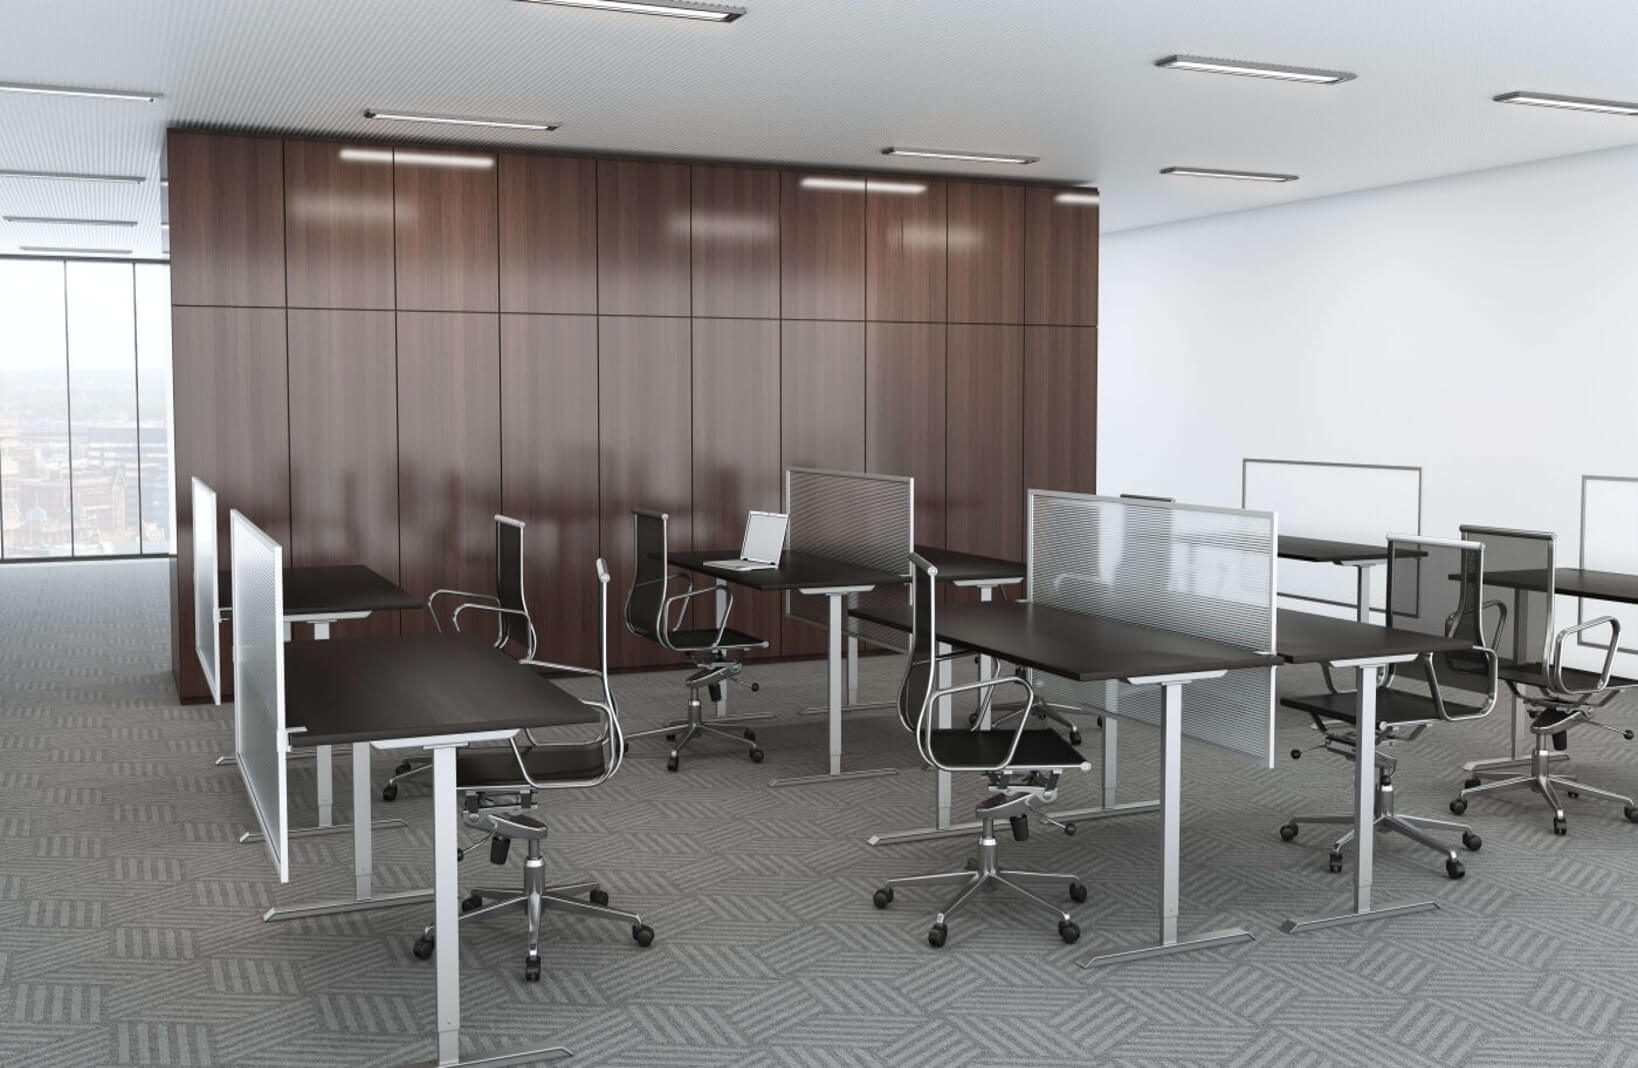 office devider. Office Divider Panels Environmental Side 1 2 Devider M